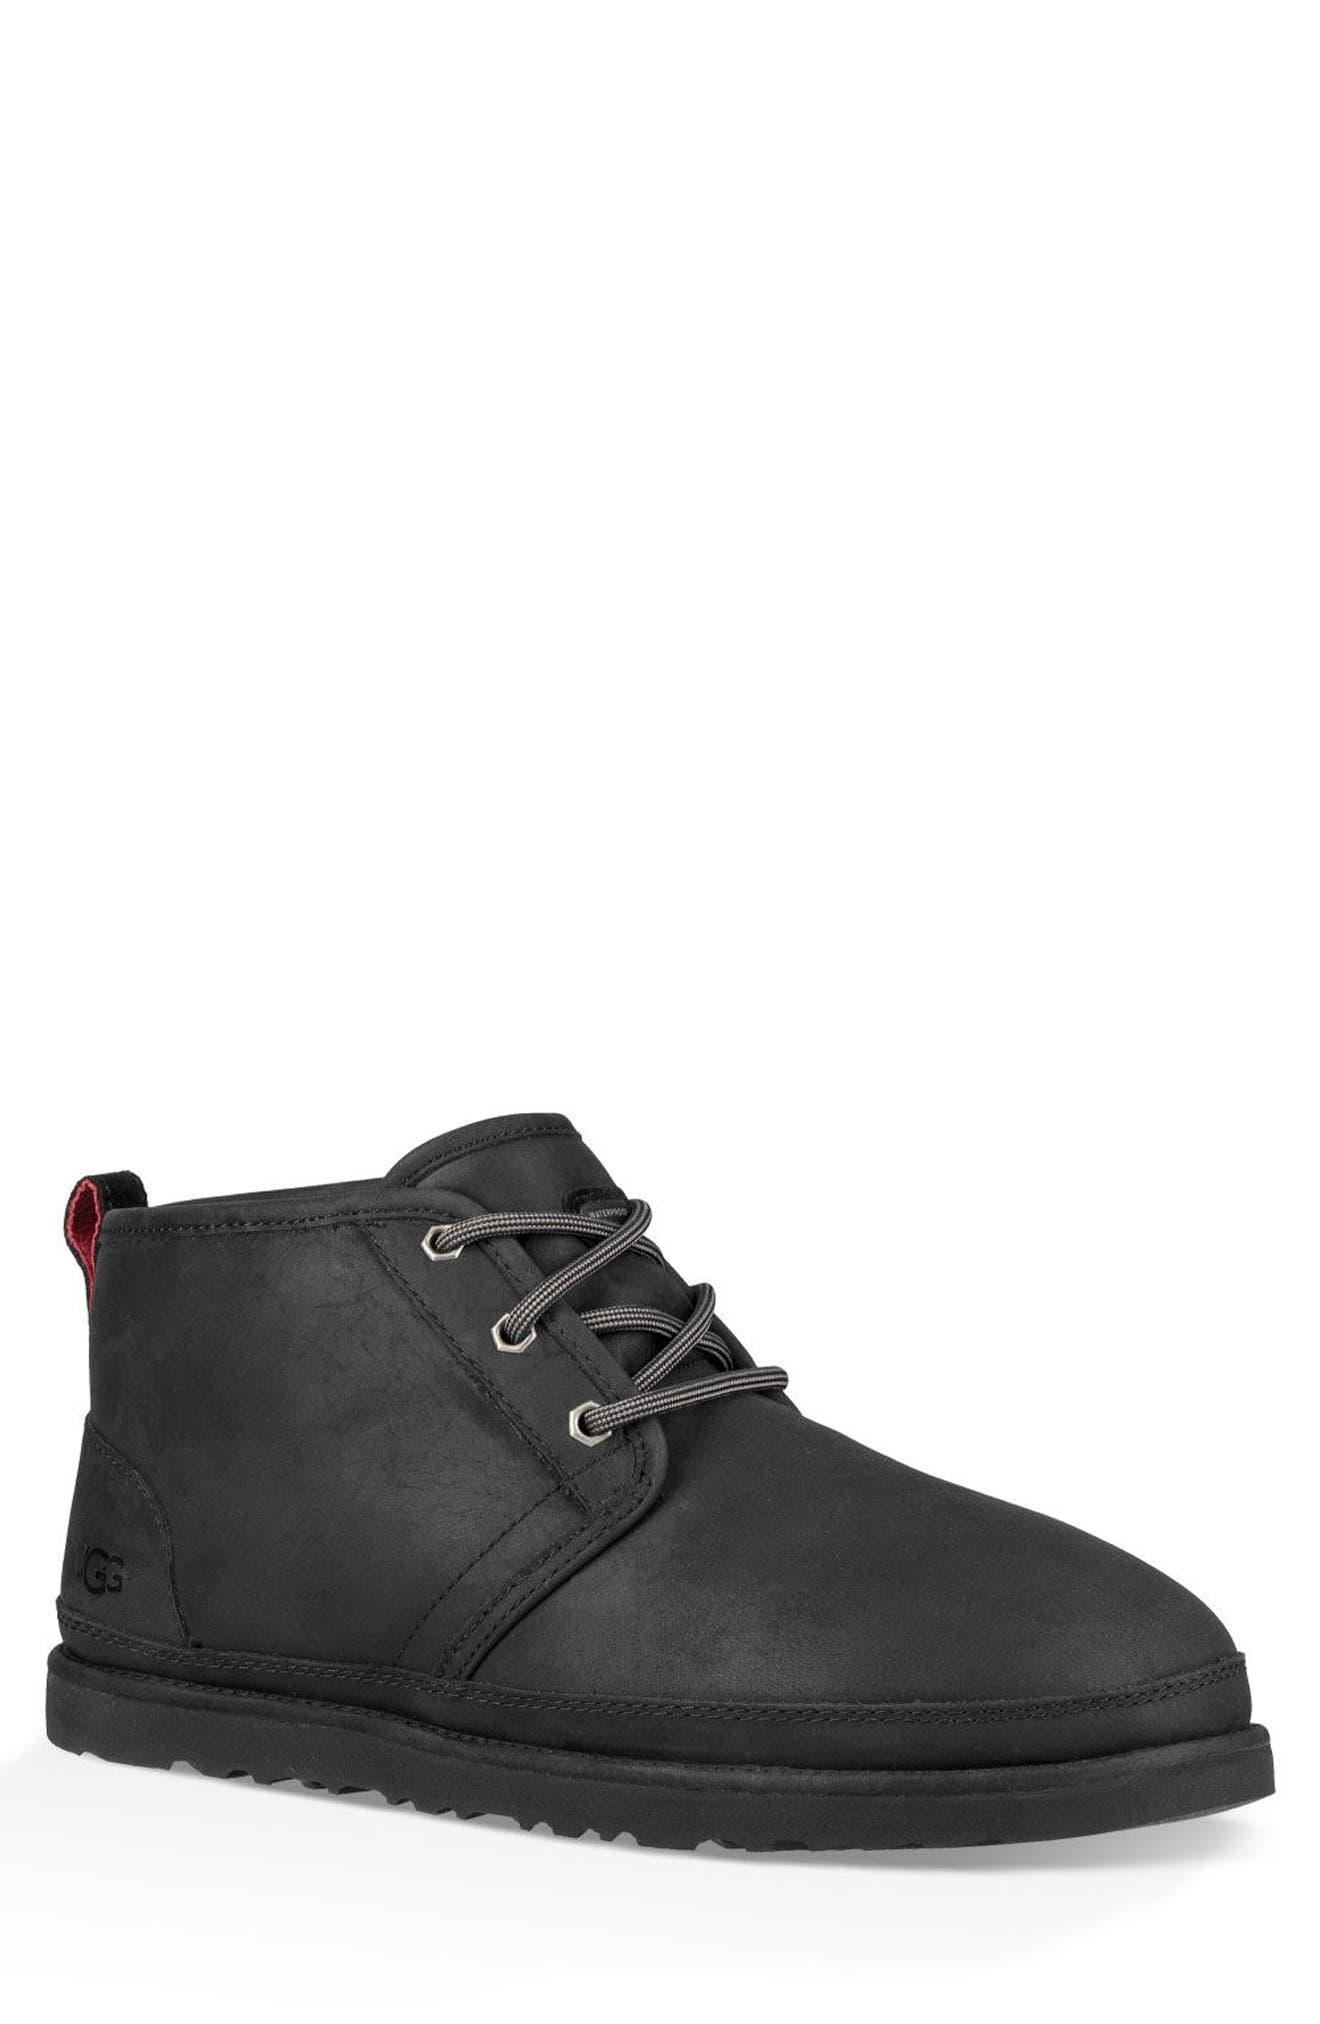 Ugg Neumel Waterproof Chukka Boot, Black